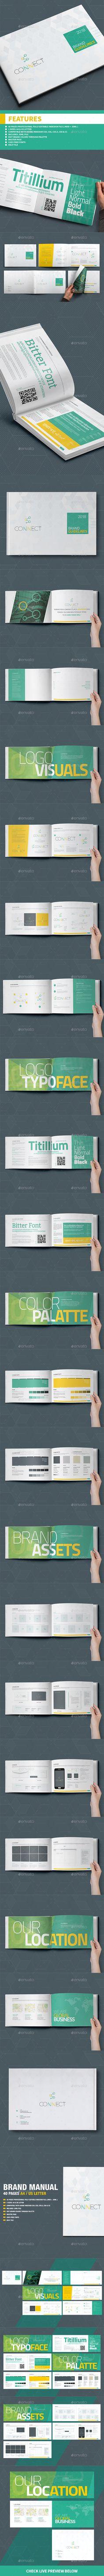 Brand Manual 40 Pages A4 / US Letter — InDesign INDD #bundle #print • Download ➝ https://graphicriver.net/item/brand-manual-40-pages-a4-us-letter/18812486?ref=pxcr